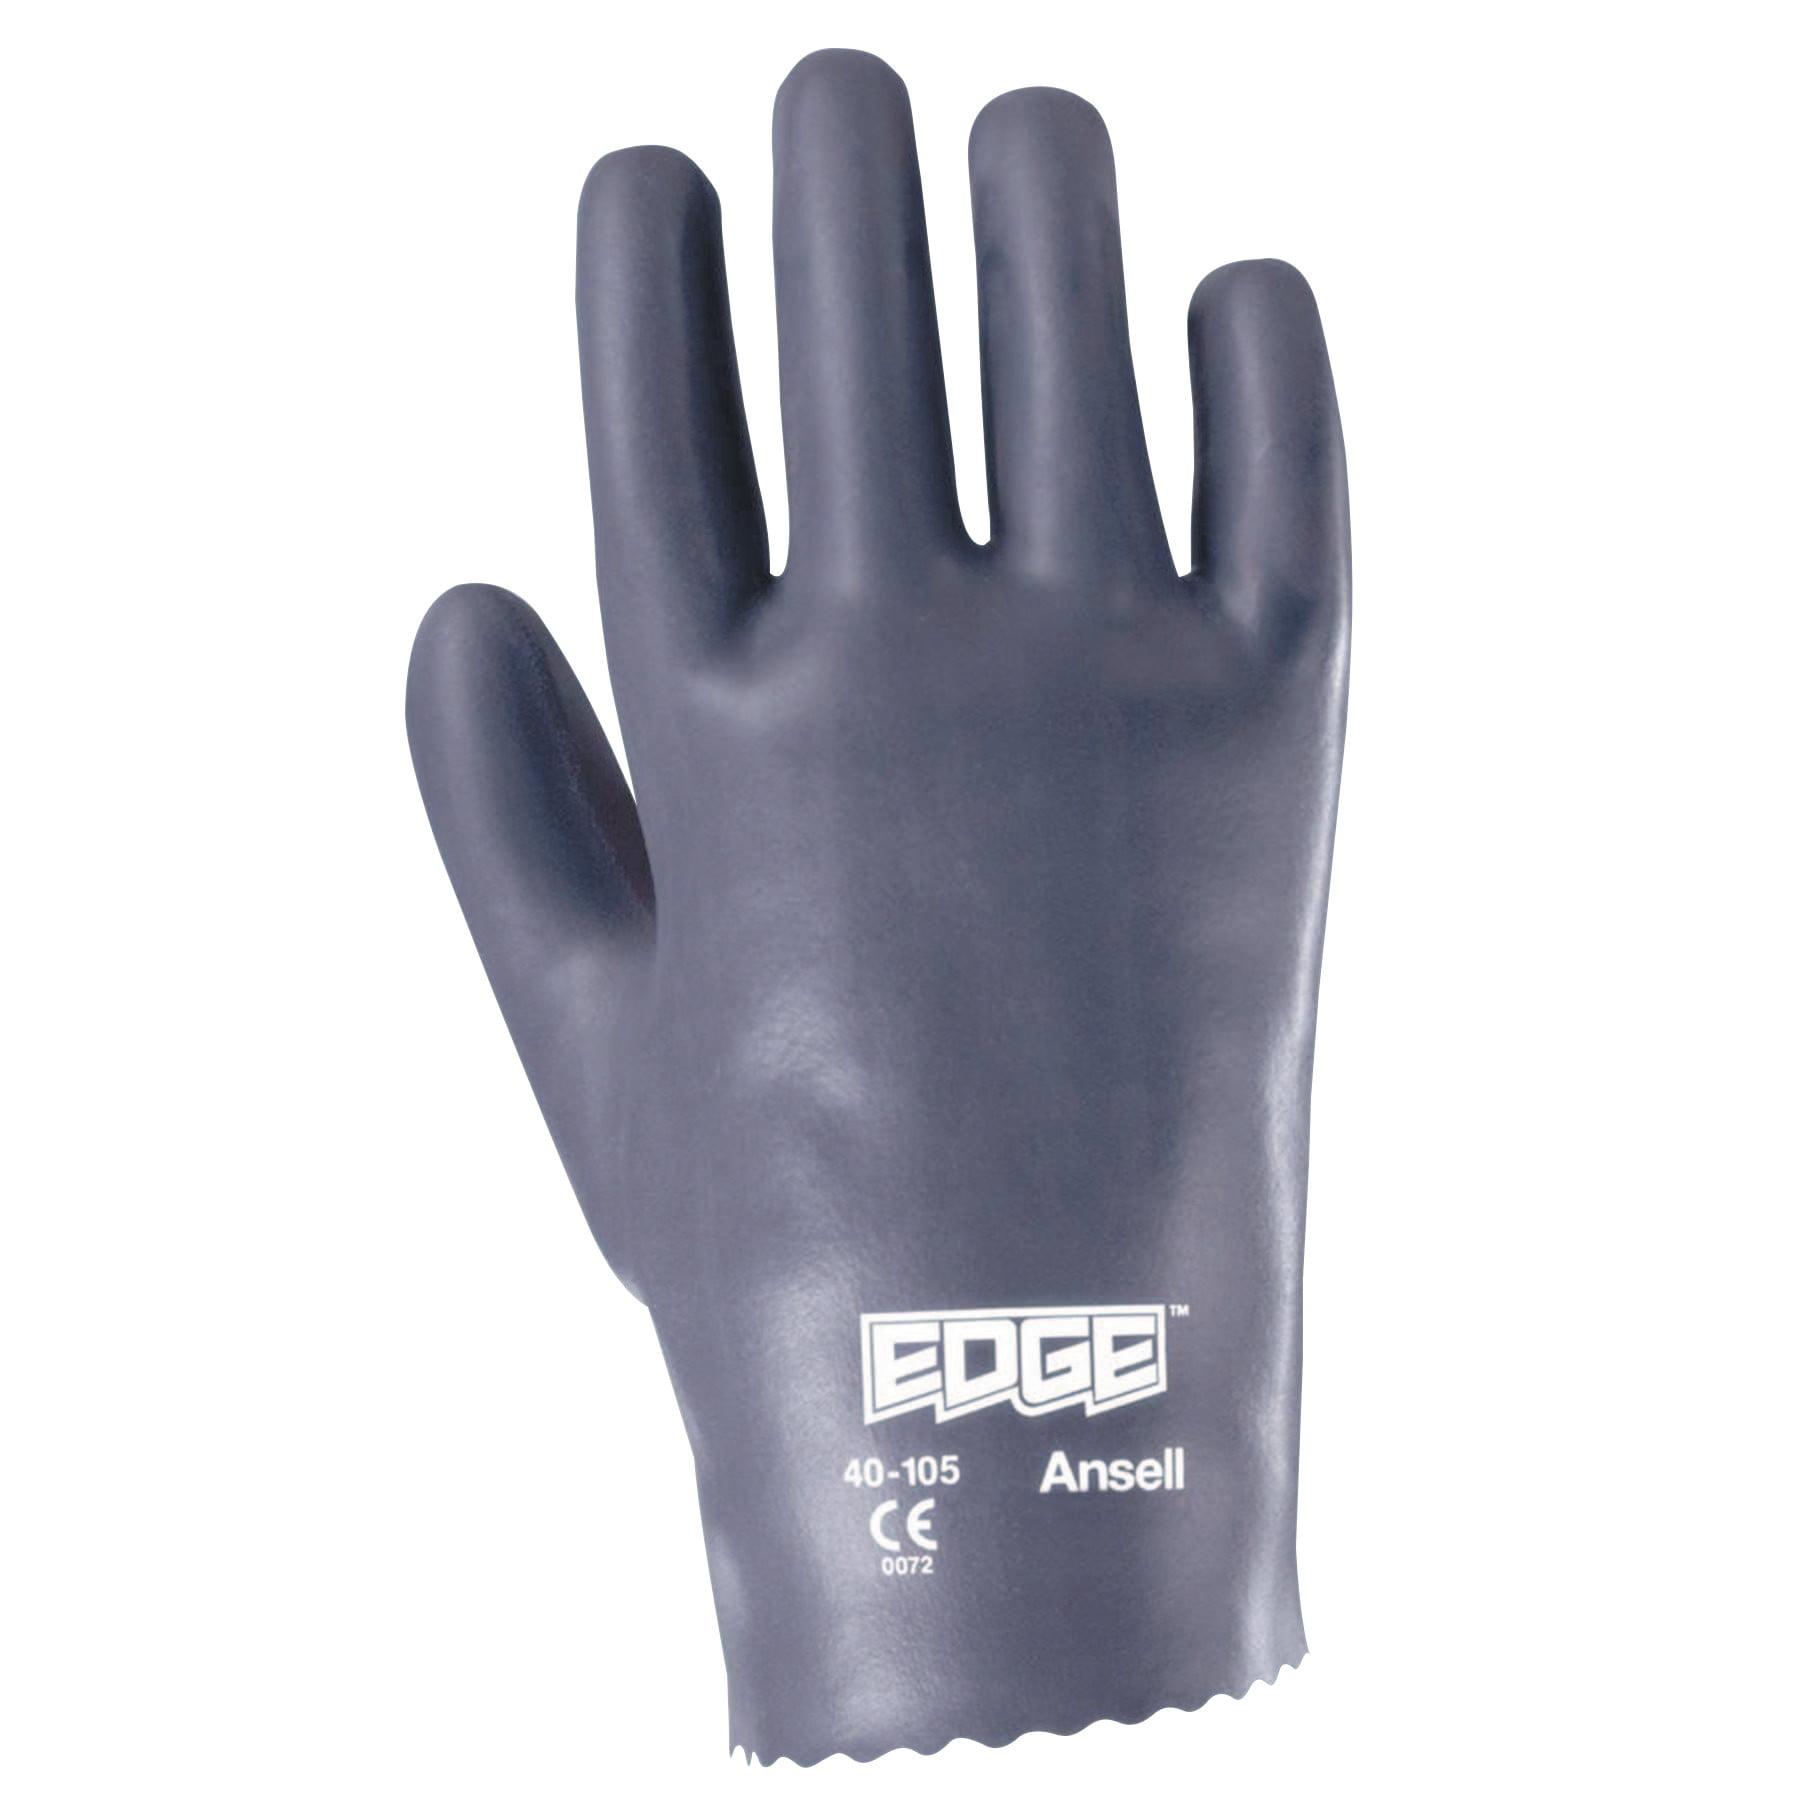 Ansell Edge Nitrile Gloves, Slip-On Cuff, Interlock Cotton, Size 9, Gray